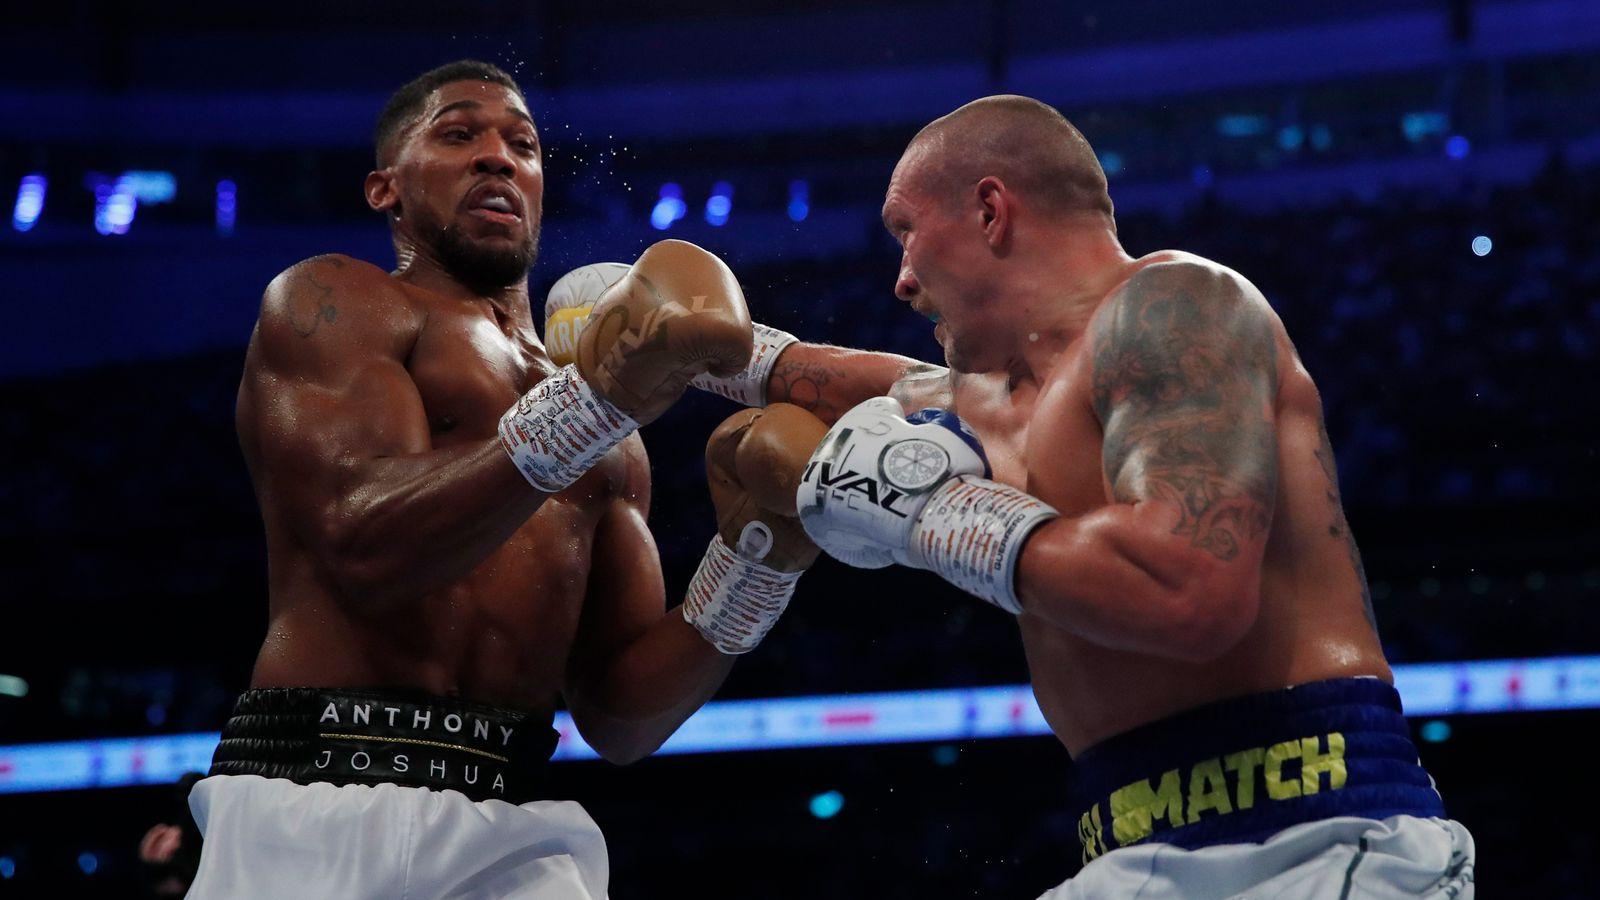 Oleksandr Usyk beats Anthony Joshua to take heavyweight titles